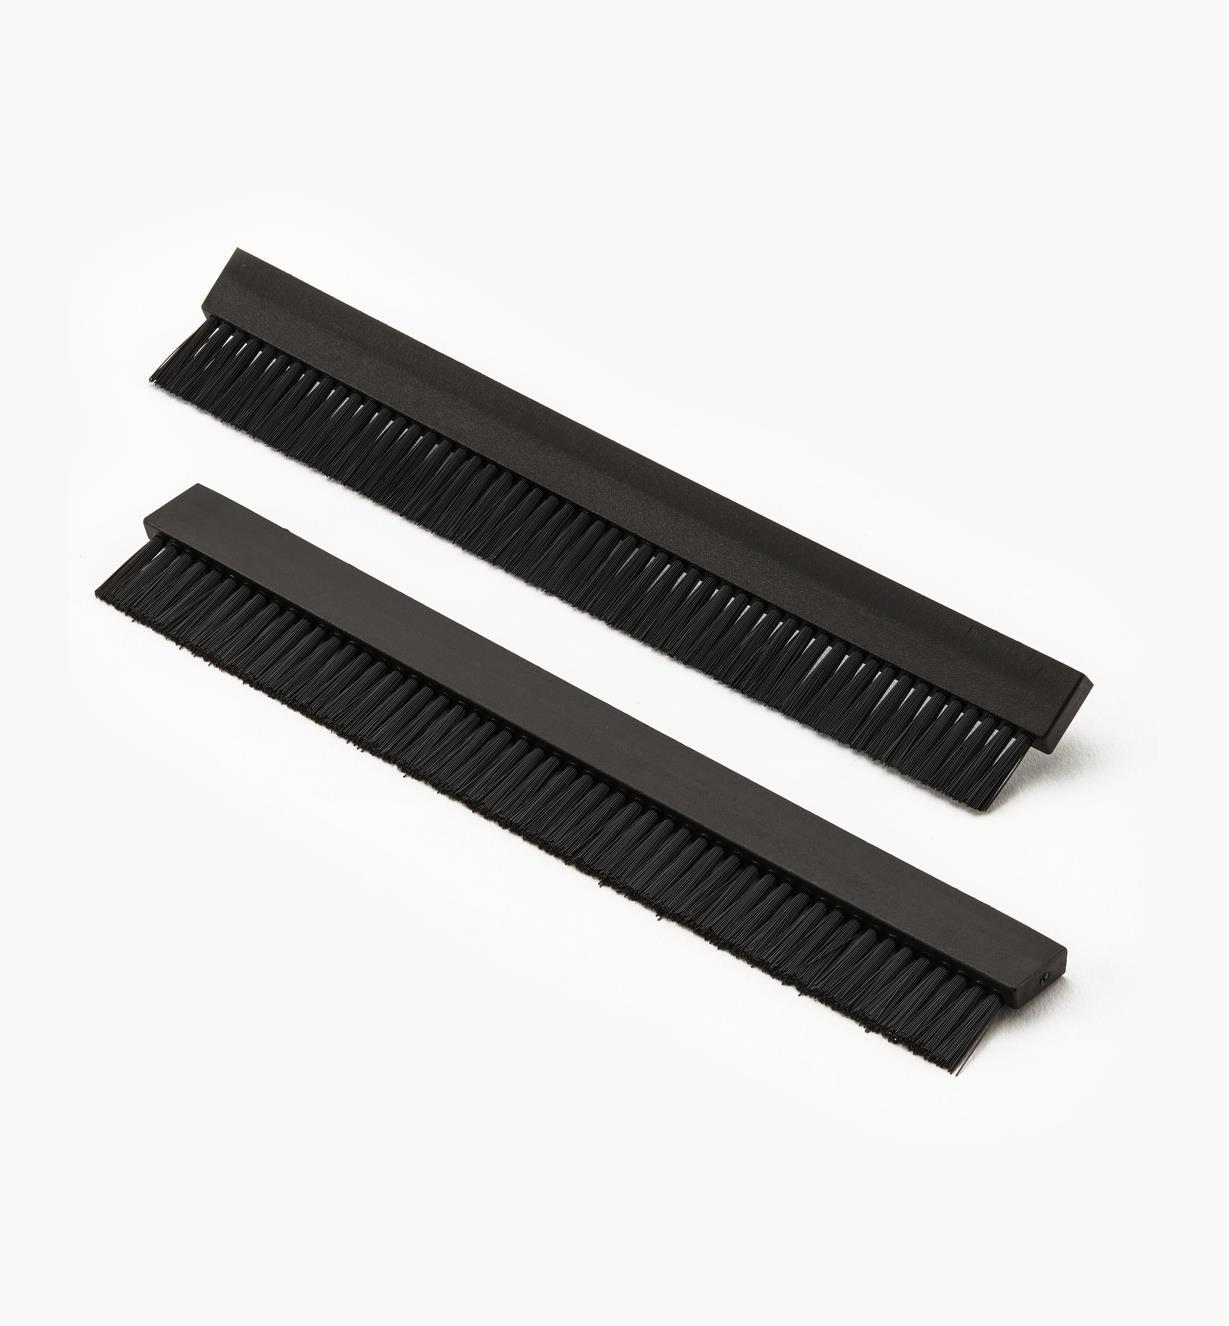 ZA484727 - Brush Insert With Plastic Bristles